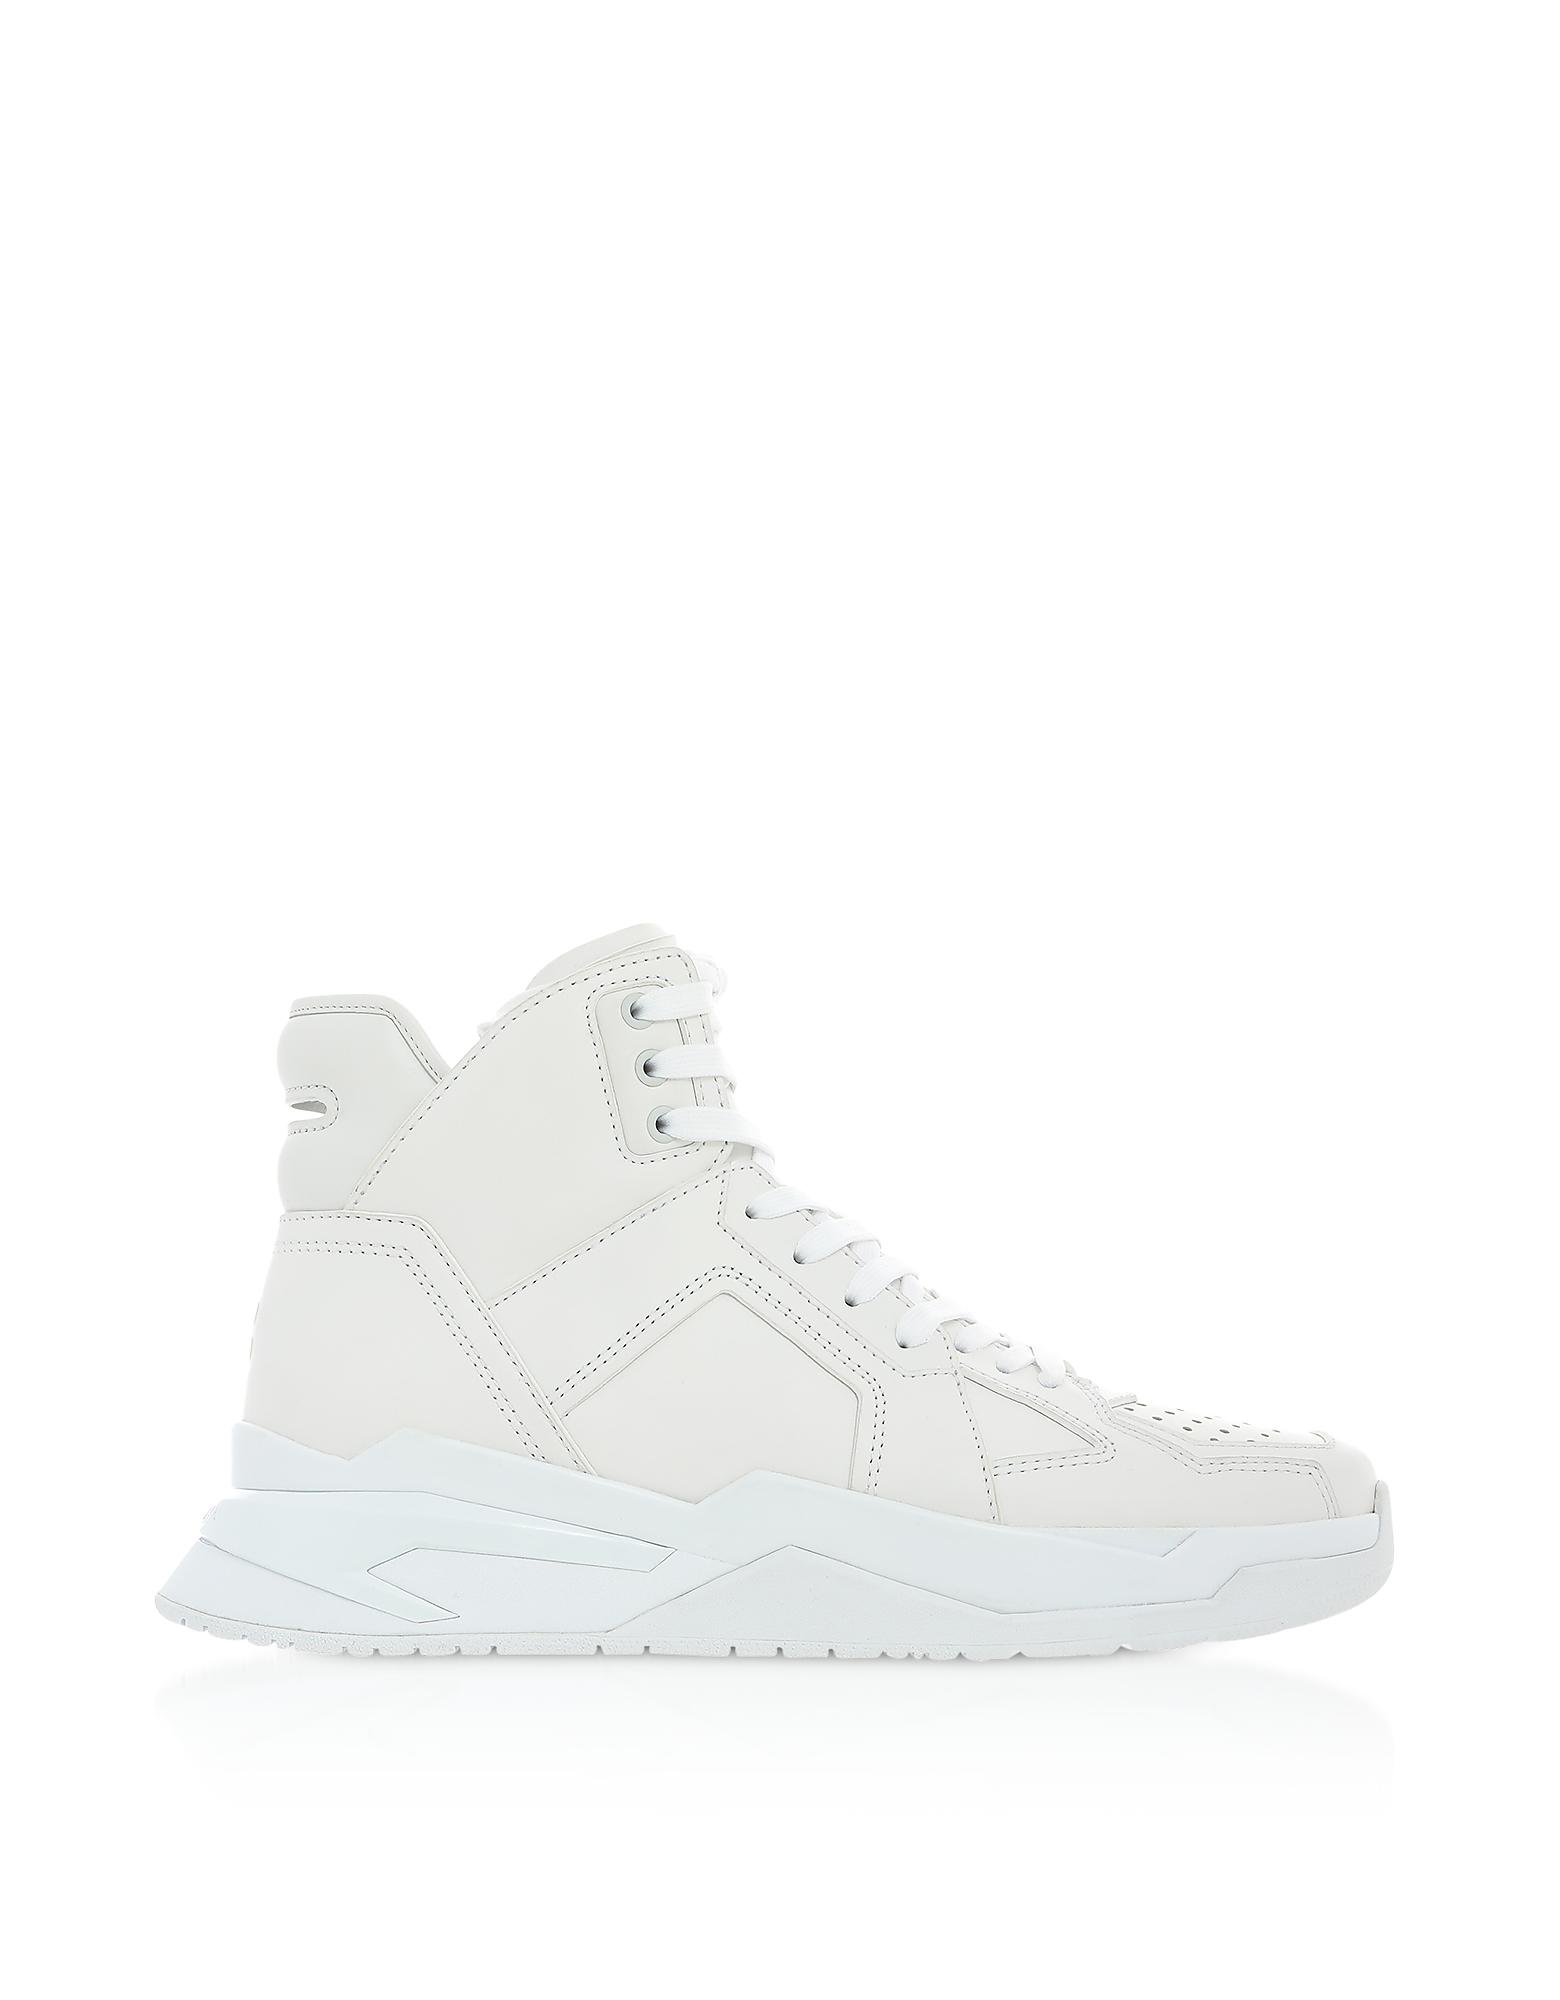 White High Top Men's B-Ball Sneakers